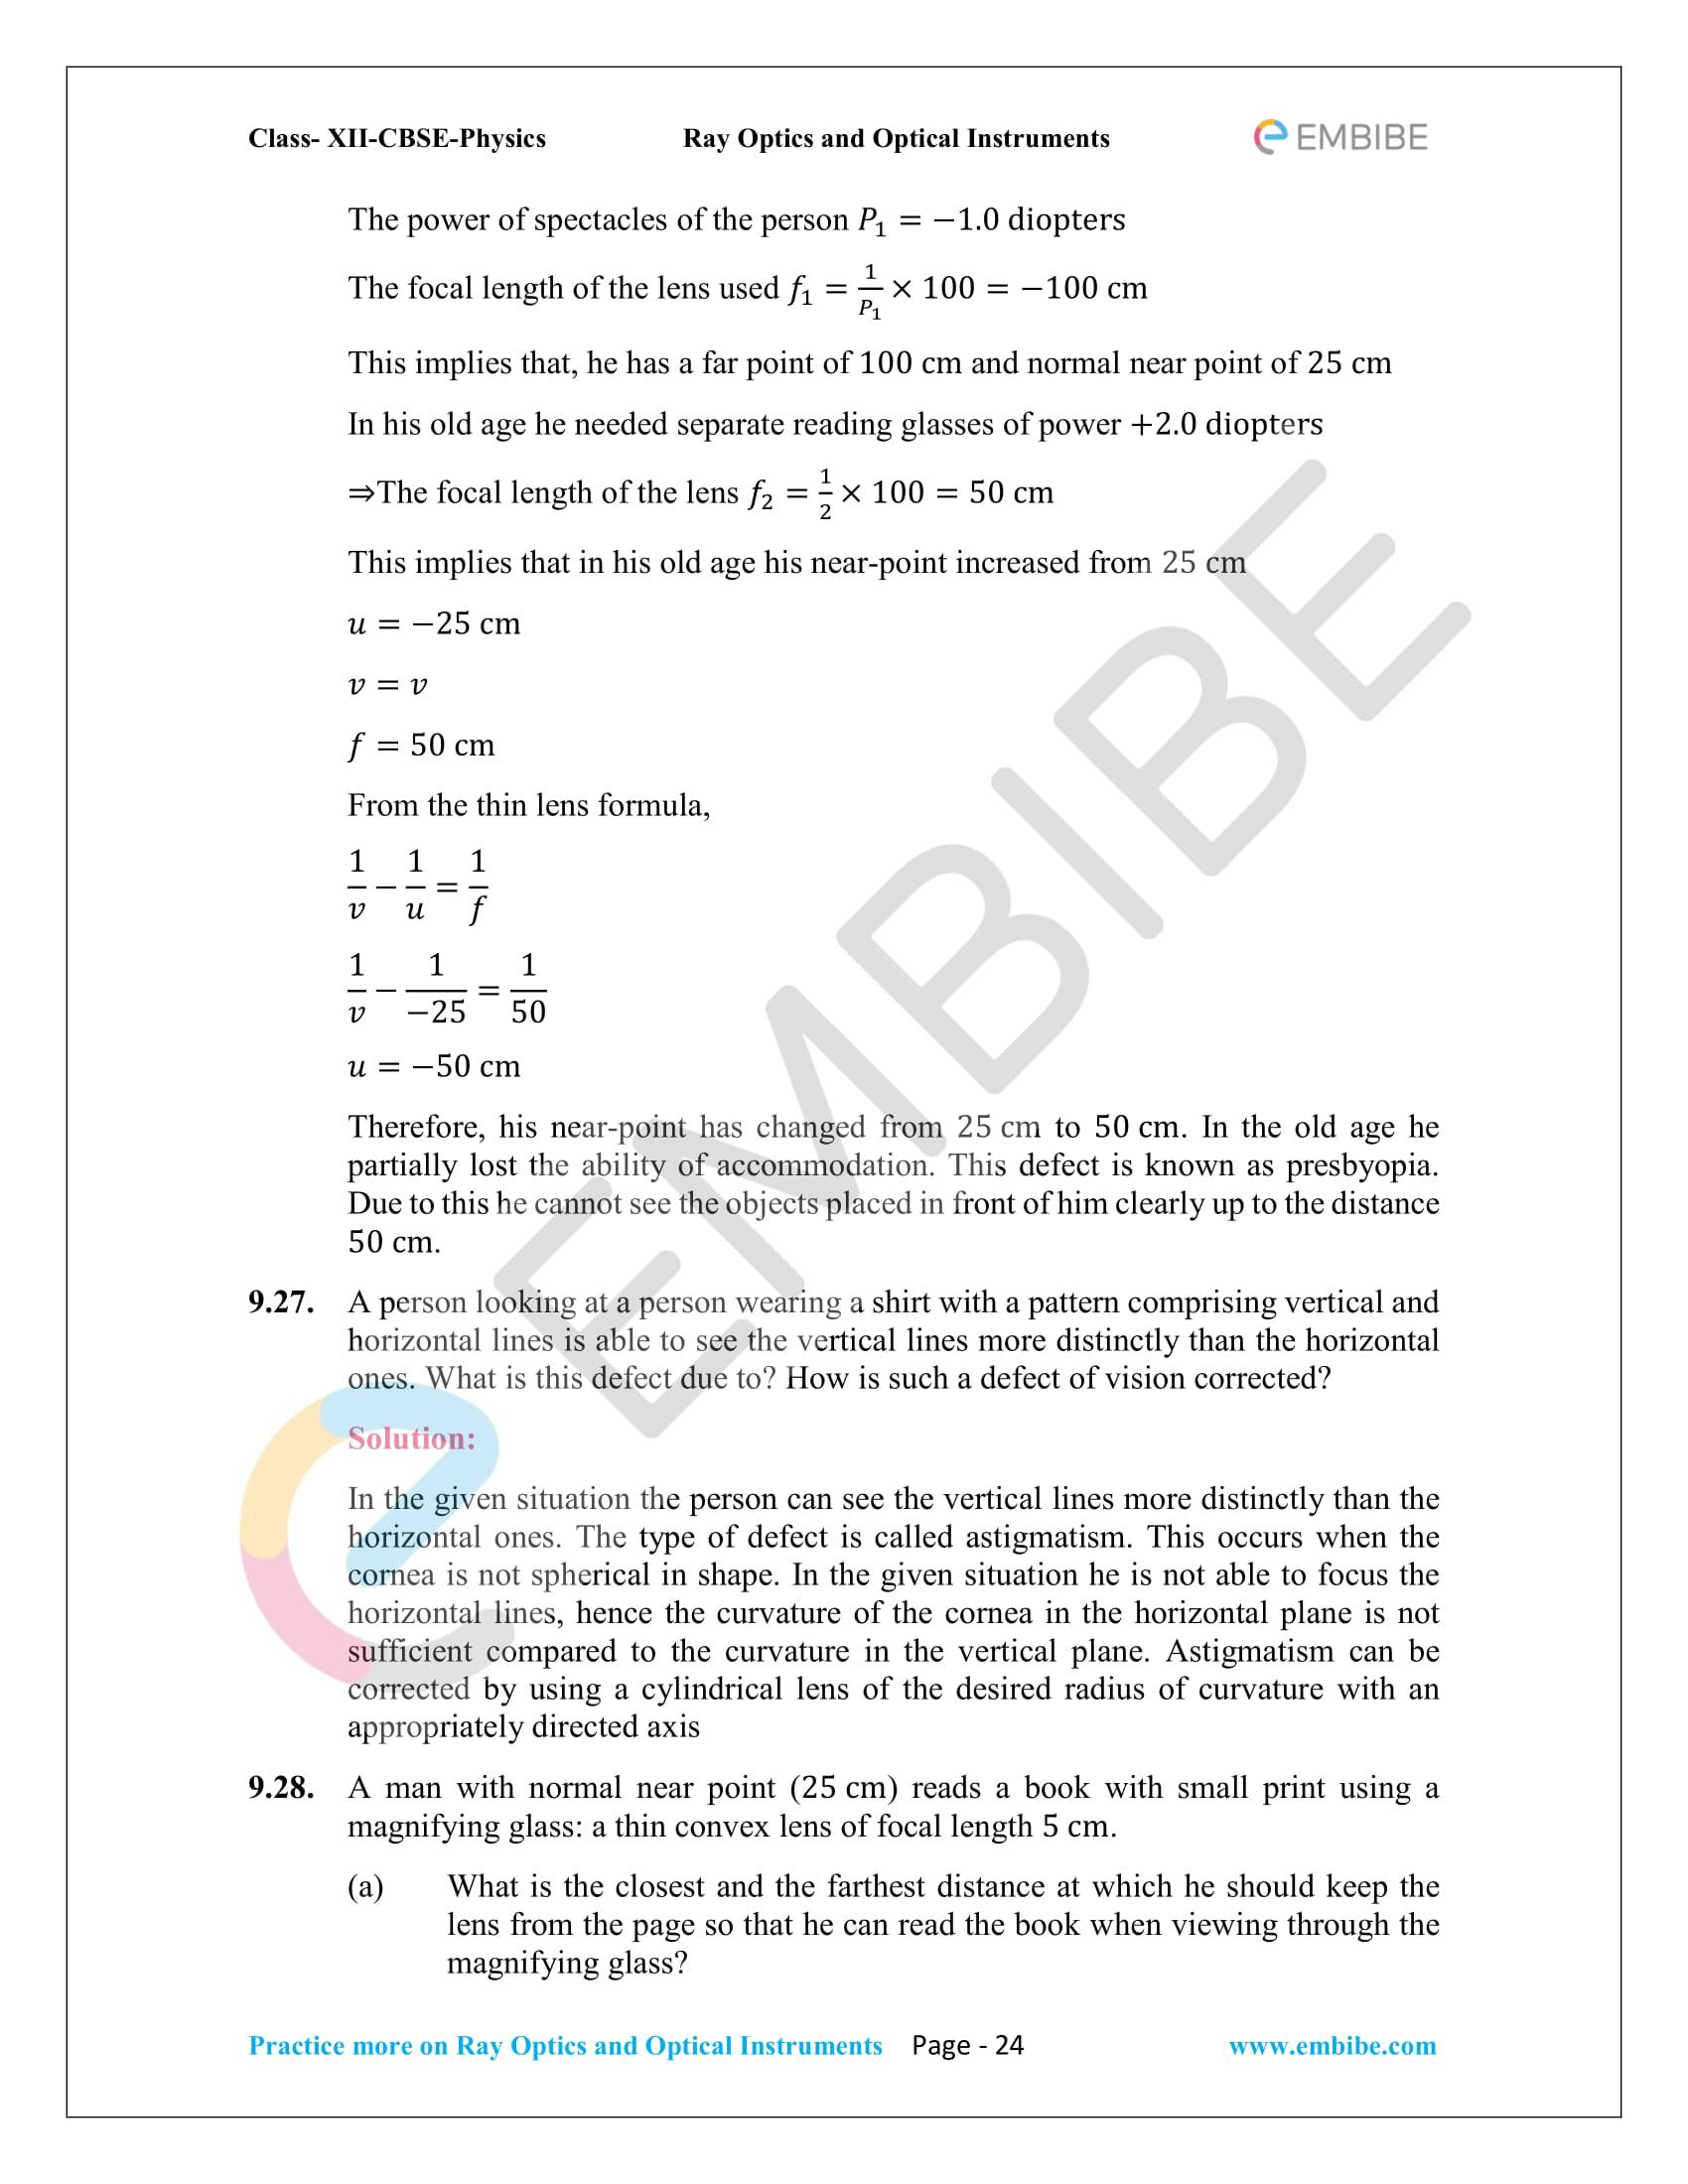 NCERT_Grade 12_Physics_Ch_09_Ray Optics-24